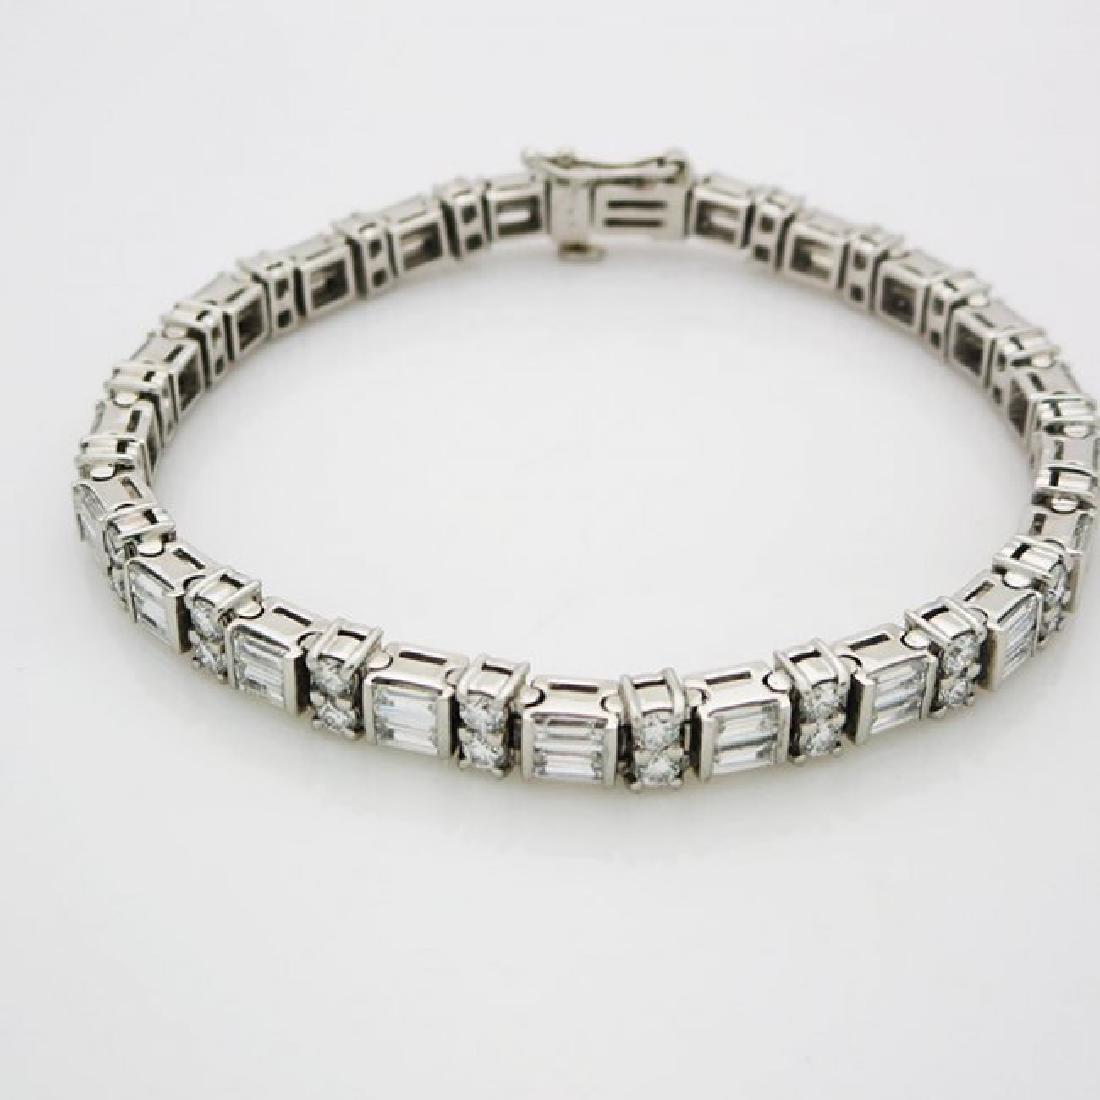 Estate 950 Platinum and apx 8CT VS/F Diamond Bracelet - 2